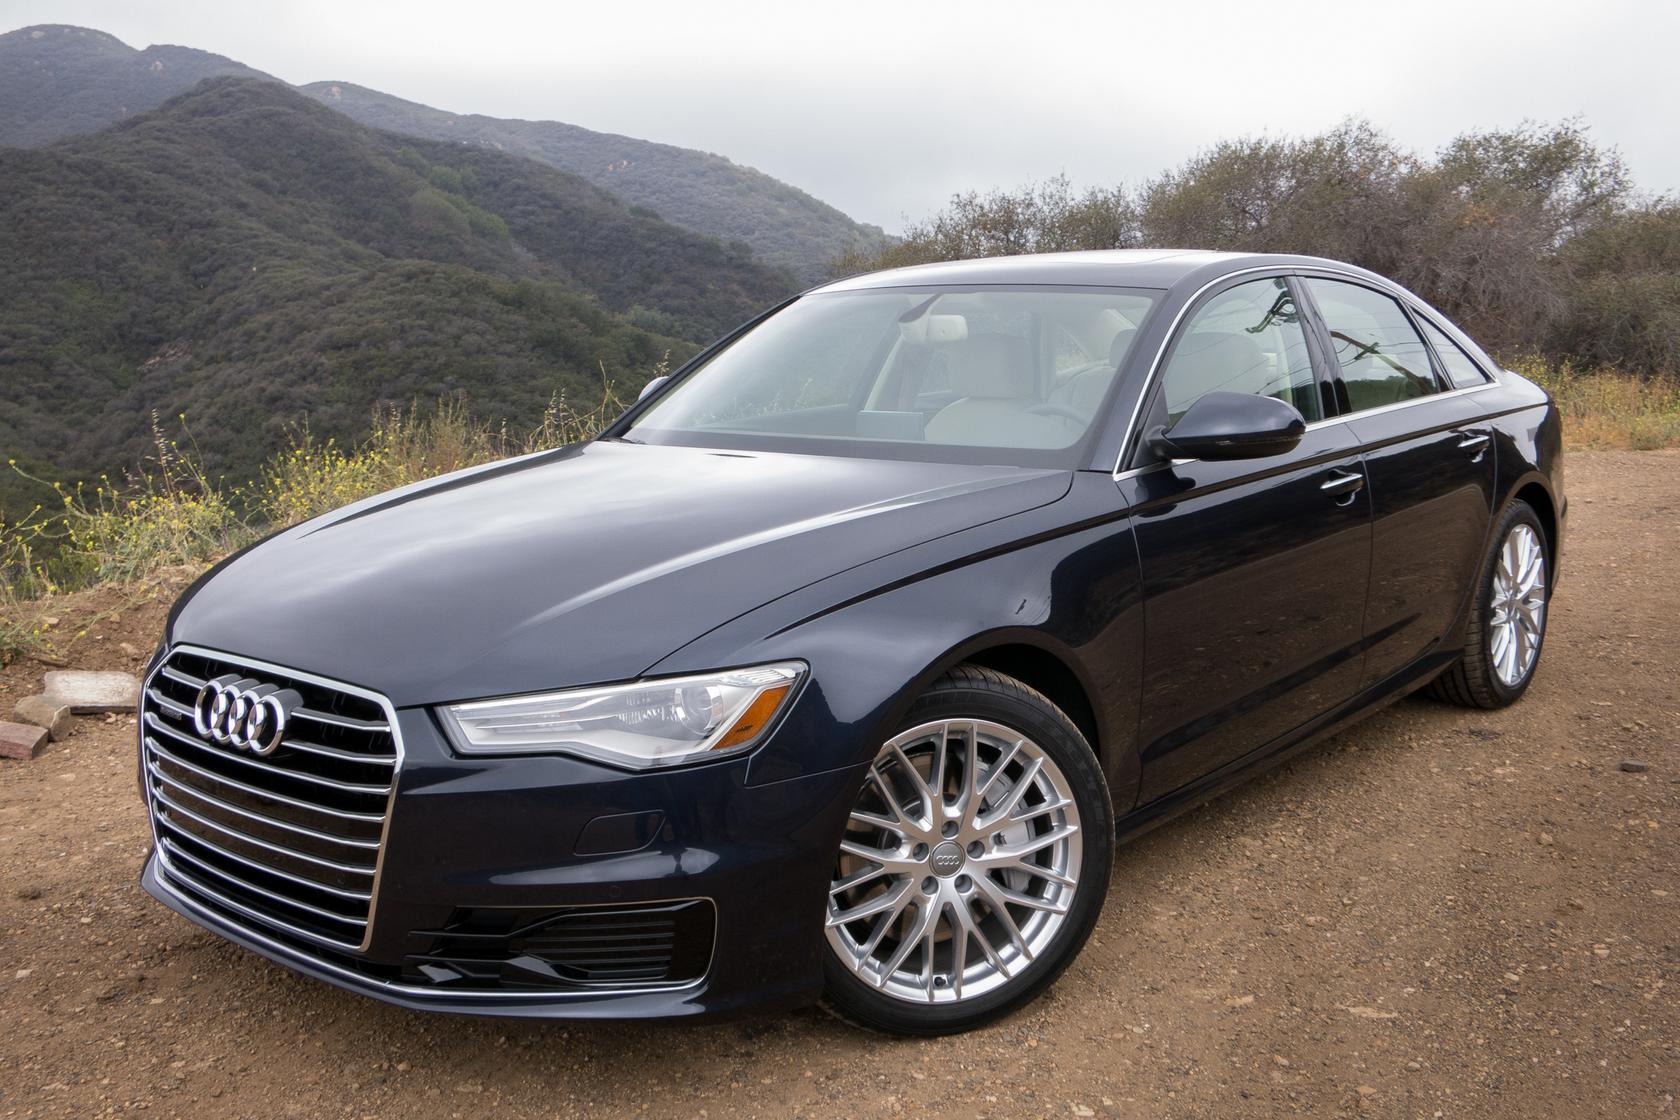 Best Luxury Cars 2016